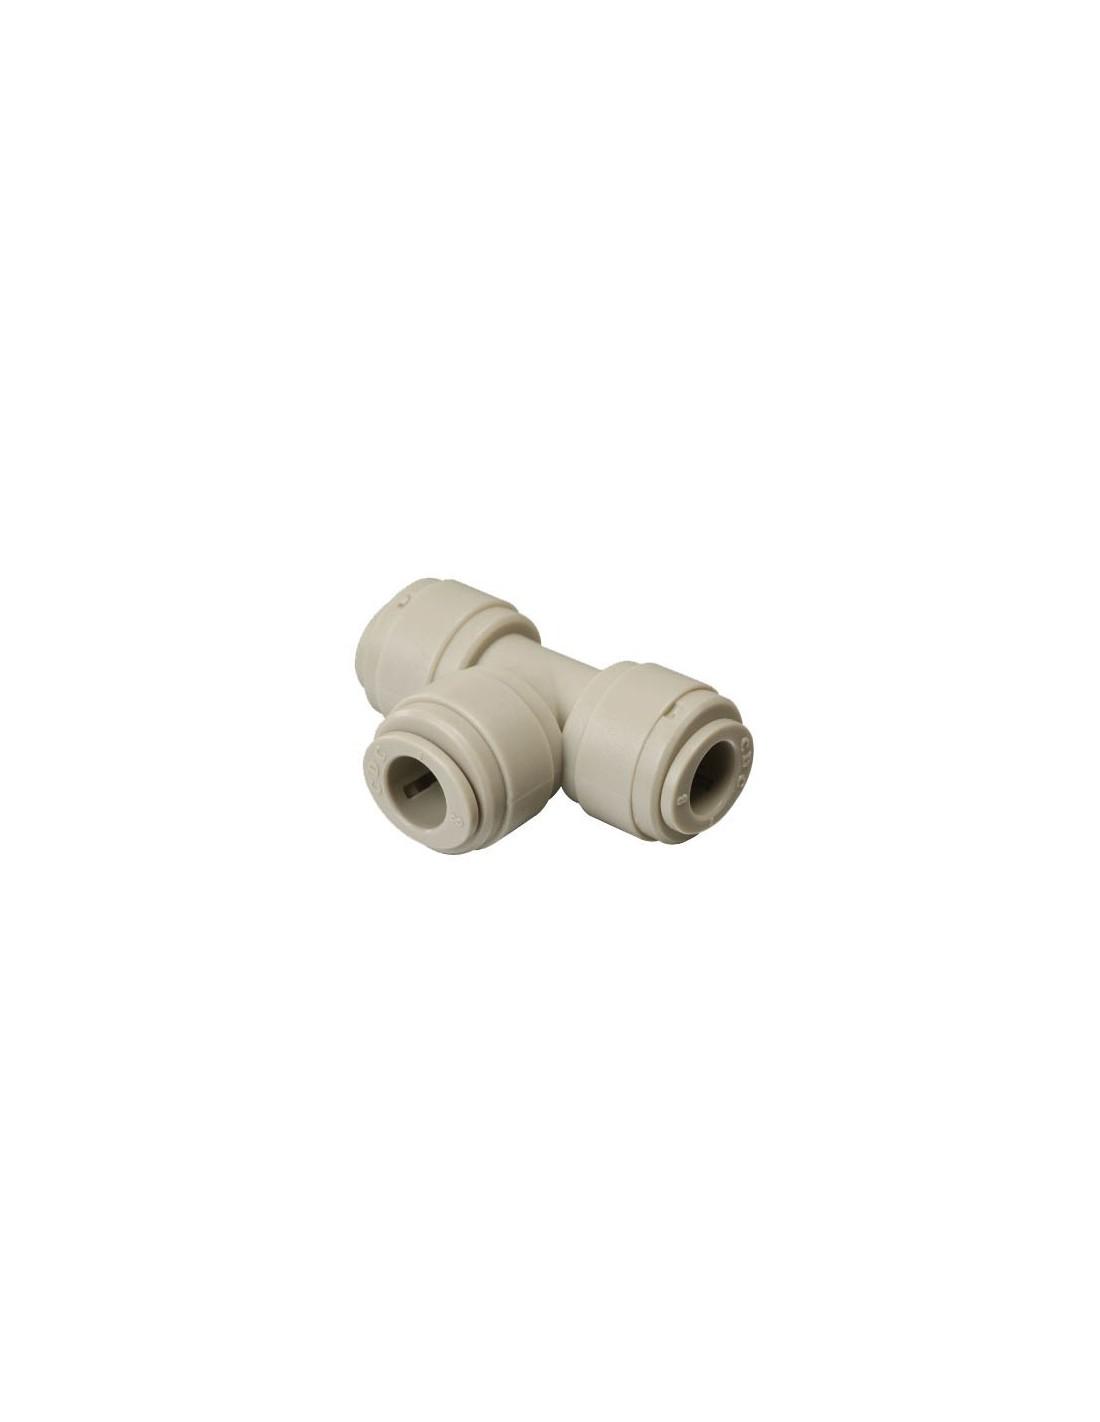 HUT-I - T-koppling  - FluidFit HUT snabbkoppling T-koppling (tum)